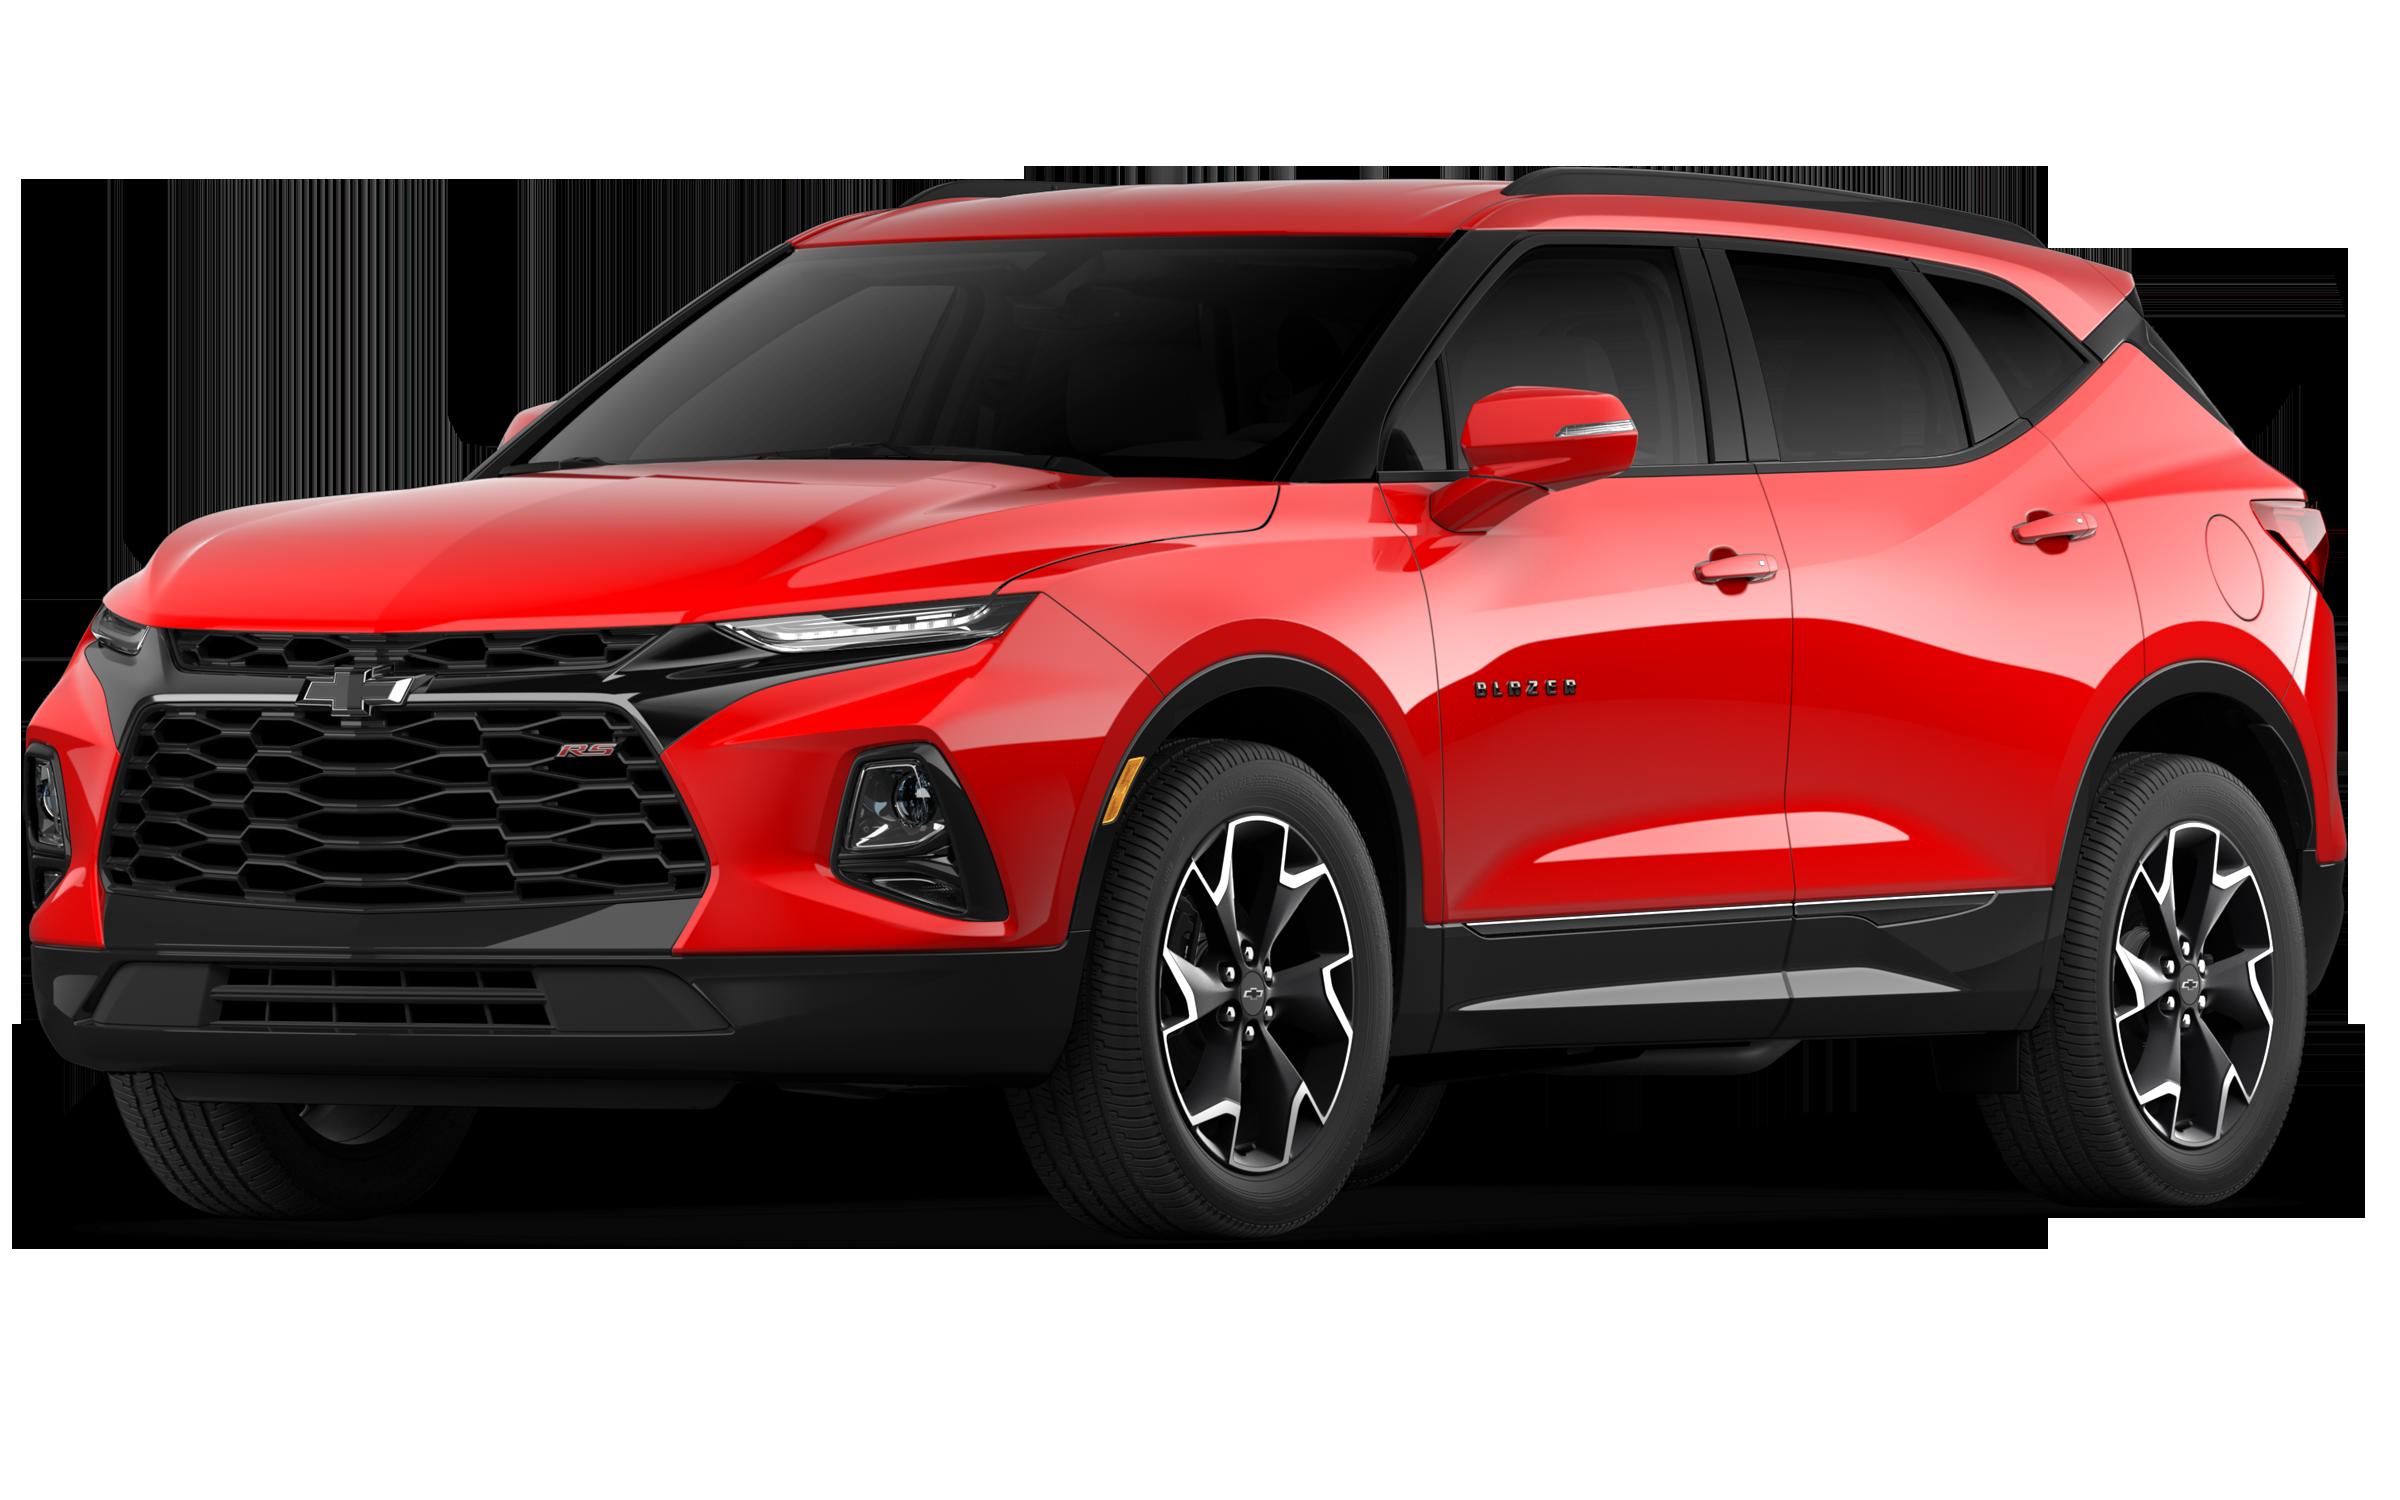 2020 Chevrolet Blazer Prices, Configurations, Reviews ...